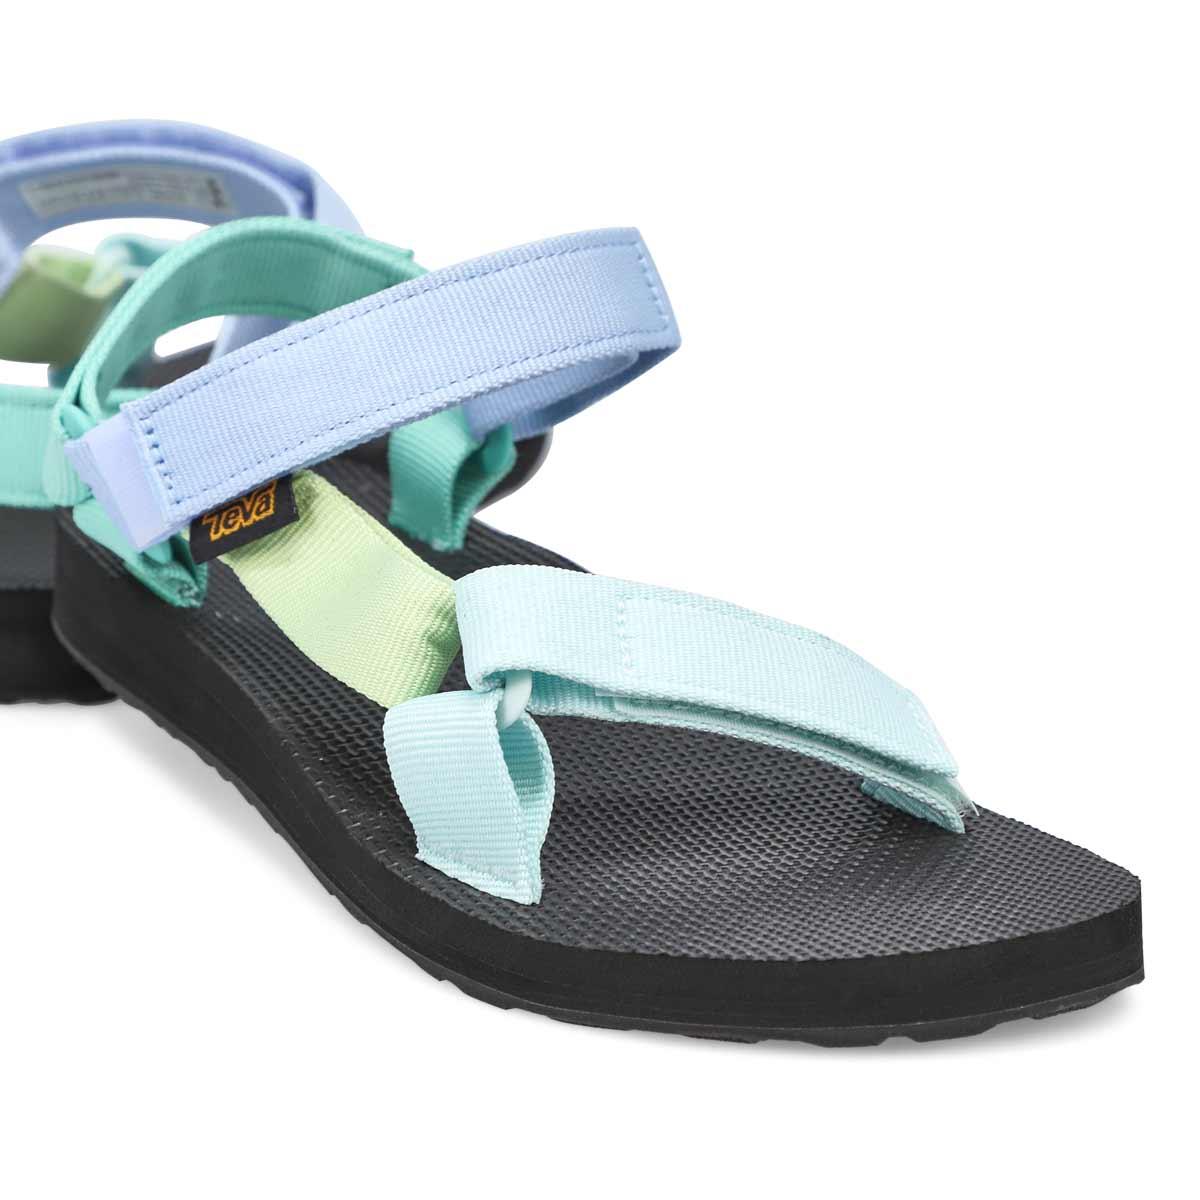 Women's Original Universal Sport Sandal - Grn/Mult